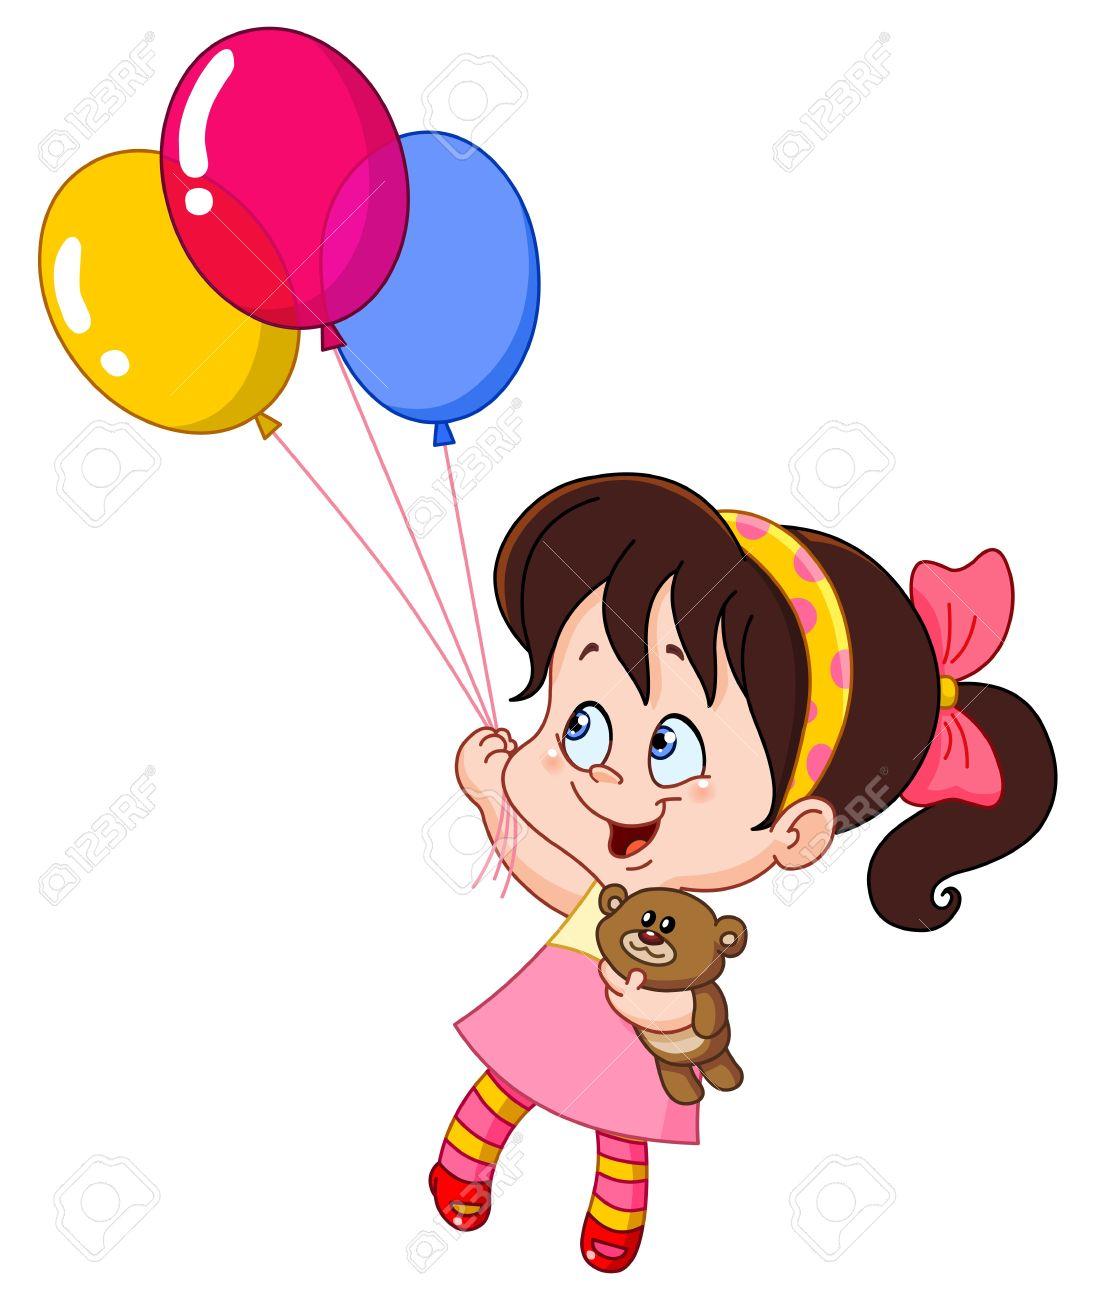 1096x1300 26,229 Balloon Girl Stock Vector Illustration And Royalty Free